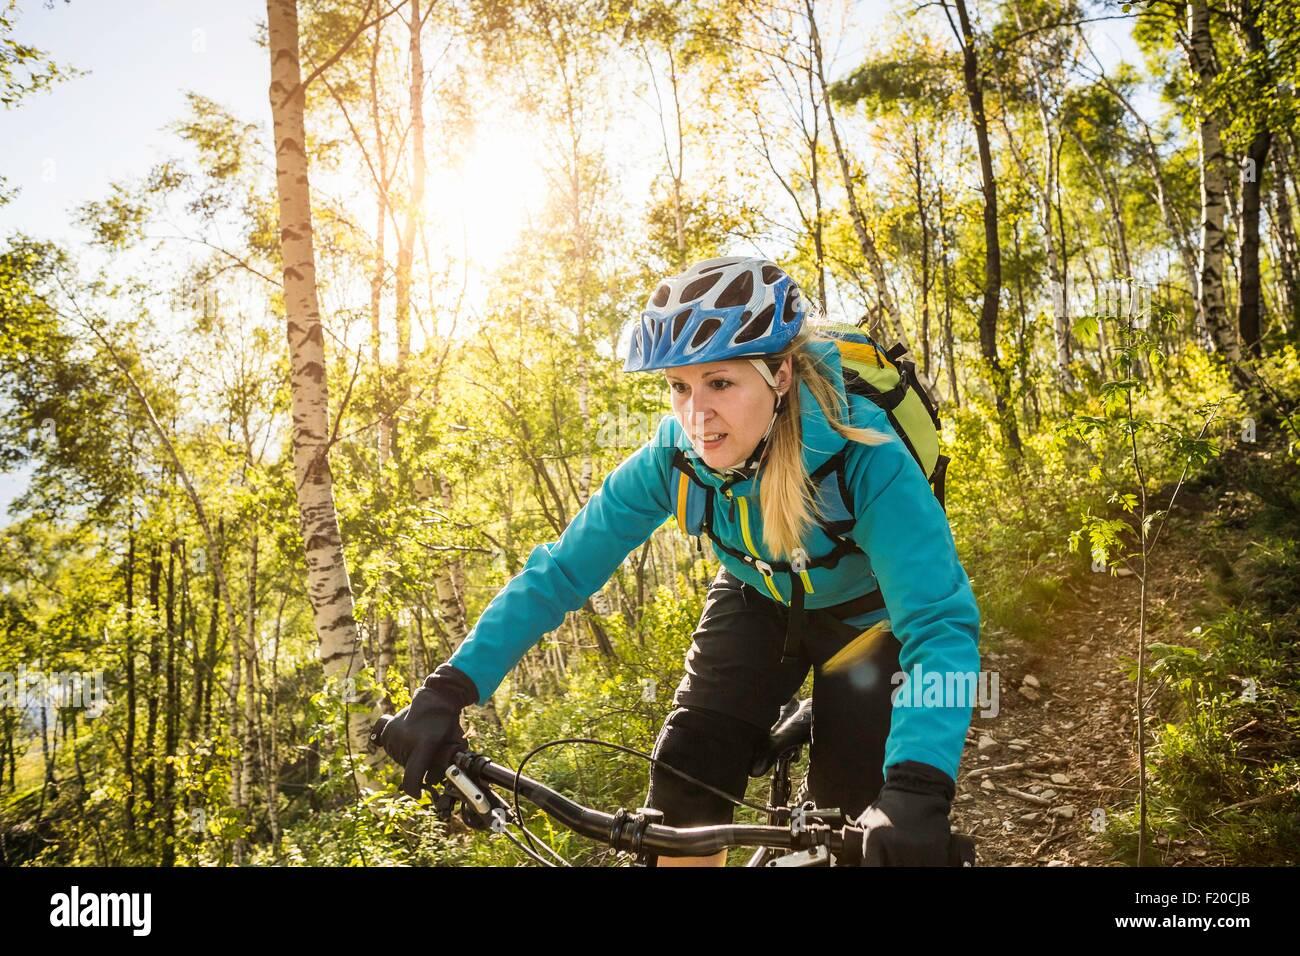 Young woman riding mountain bike through woods, Lake Como, Italy - Stock Image